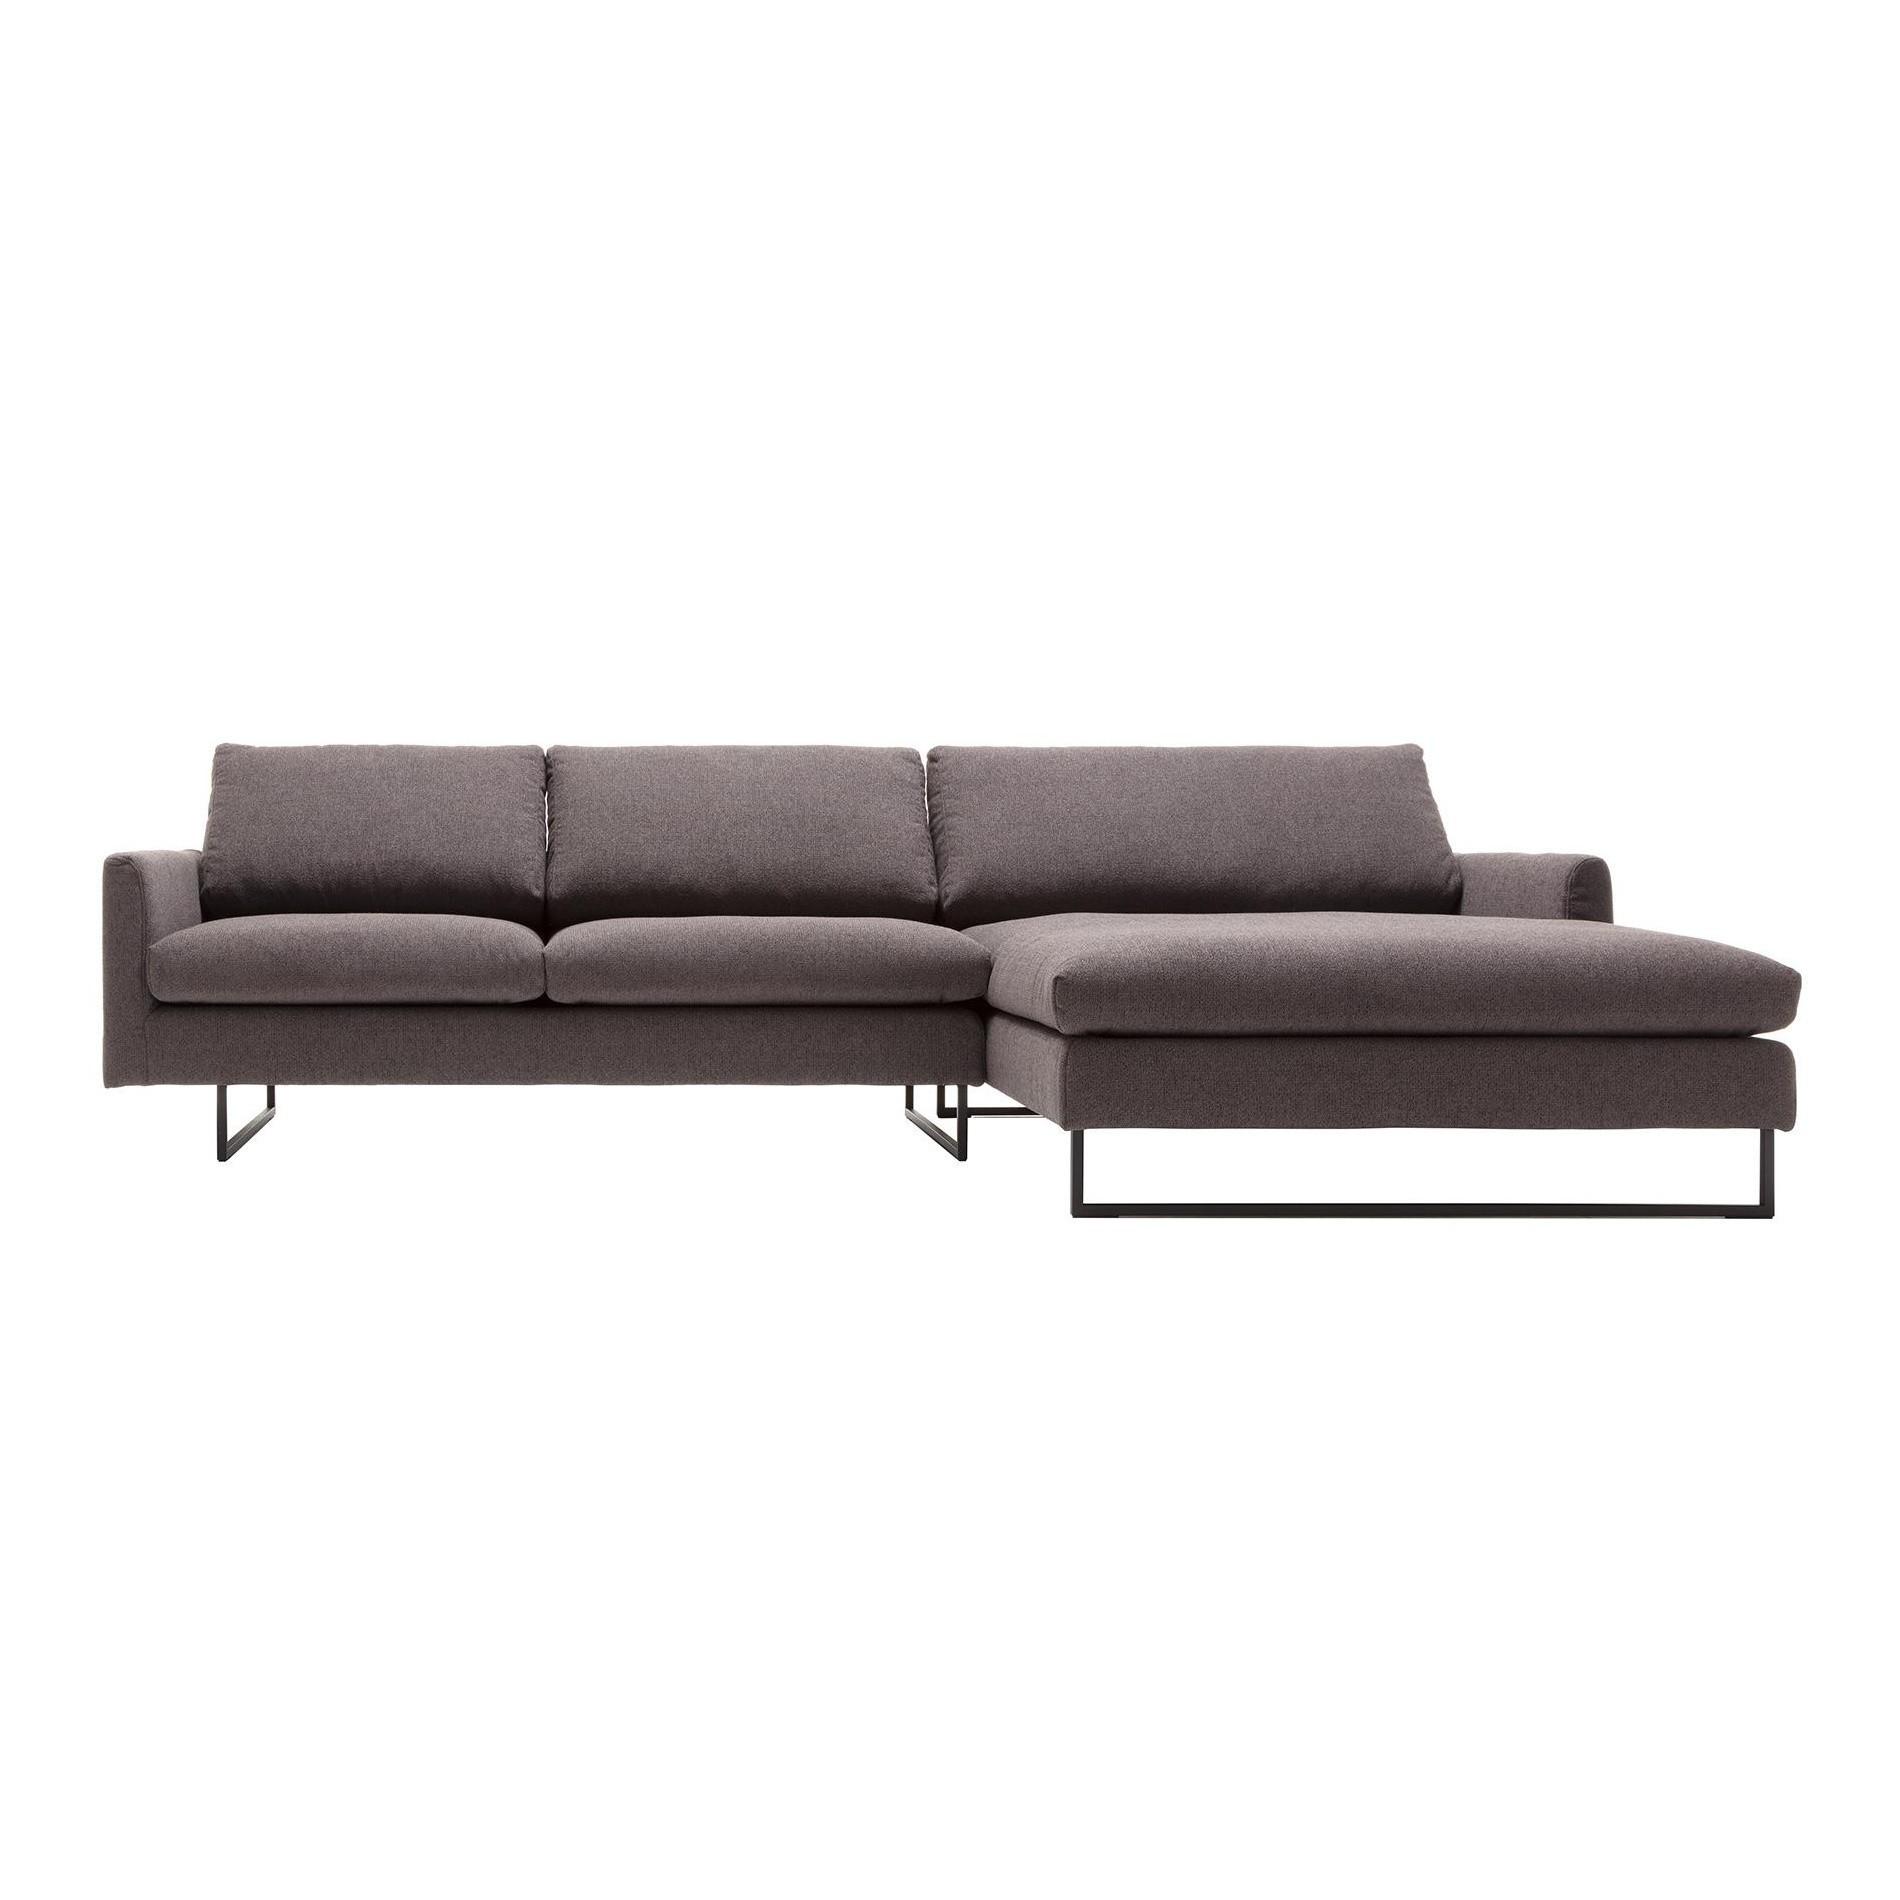 Marvelous Freistil 134 Lounge Sofa 314X177X91Cm Creativecarmelina Interior Chair Design Creativecarmelinacom